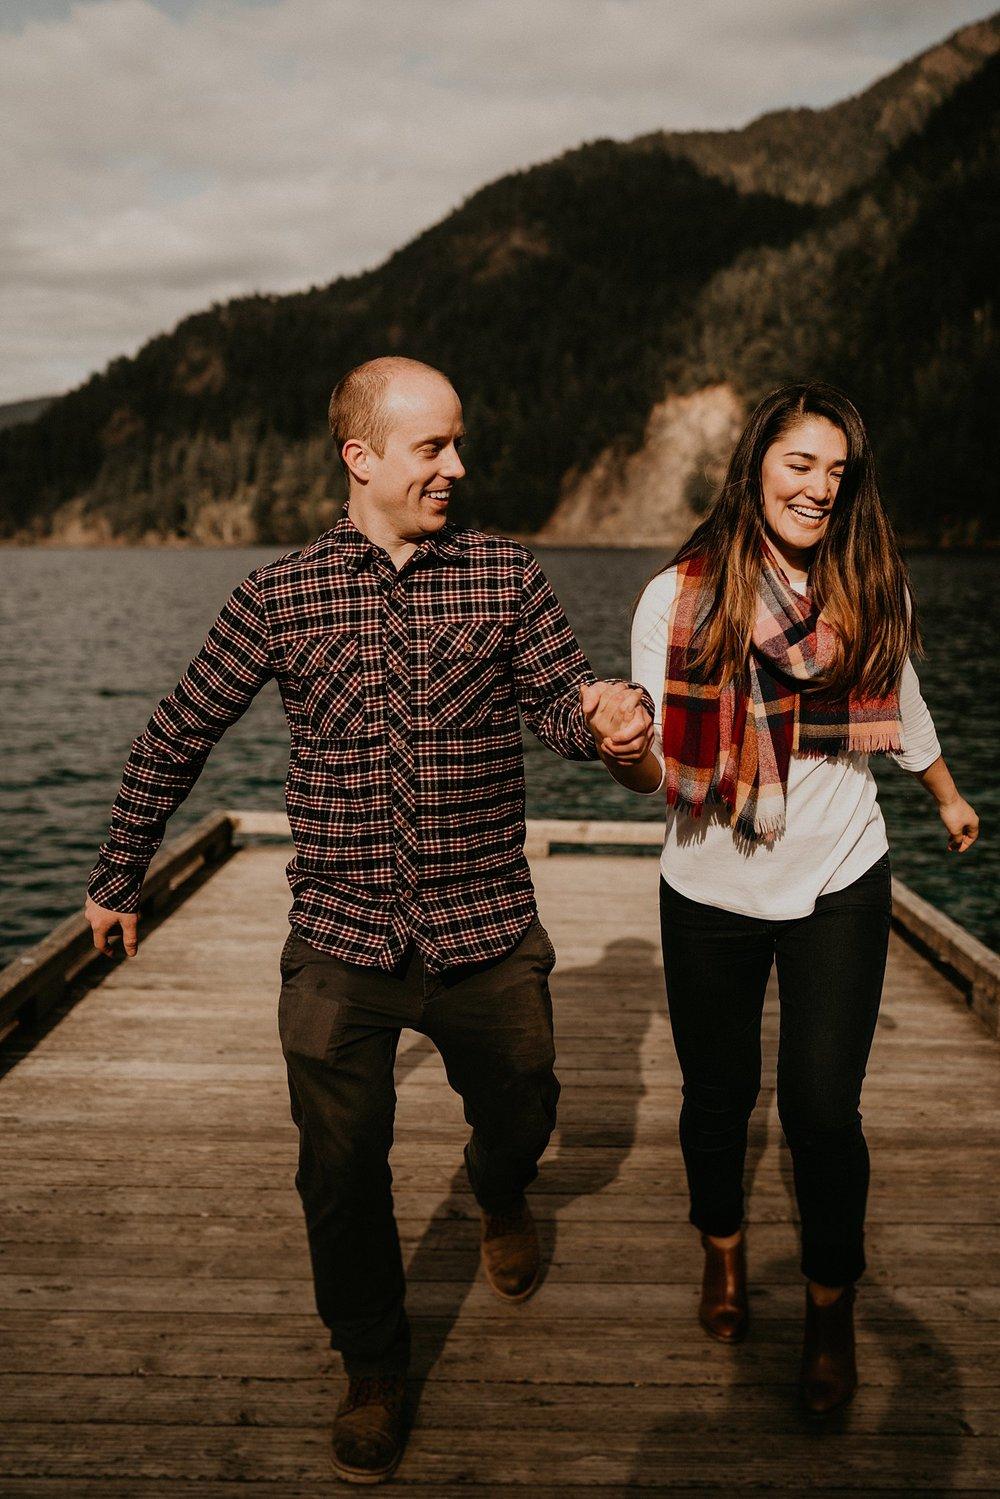 Lake-Crescent-Mount-Storm-King-Hiking-Adventure-Engagement-Seattle-Wedding-Photographer_0050.jpg